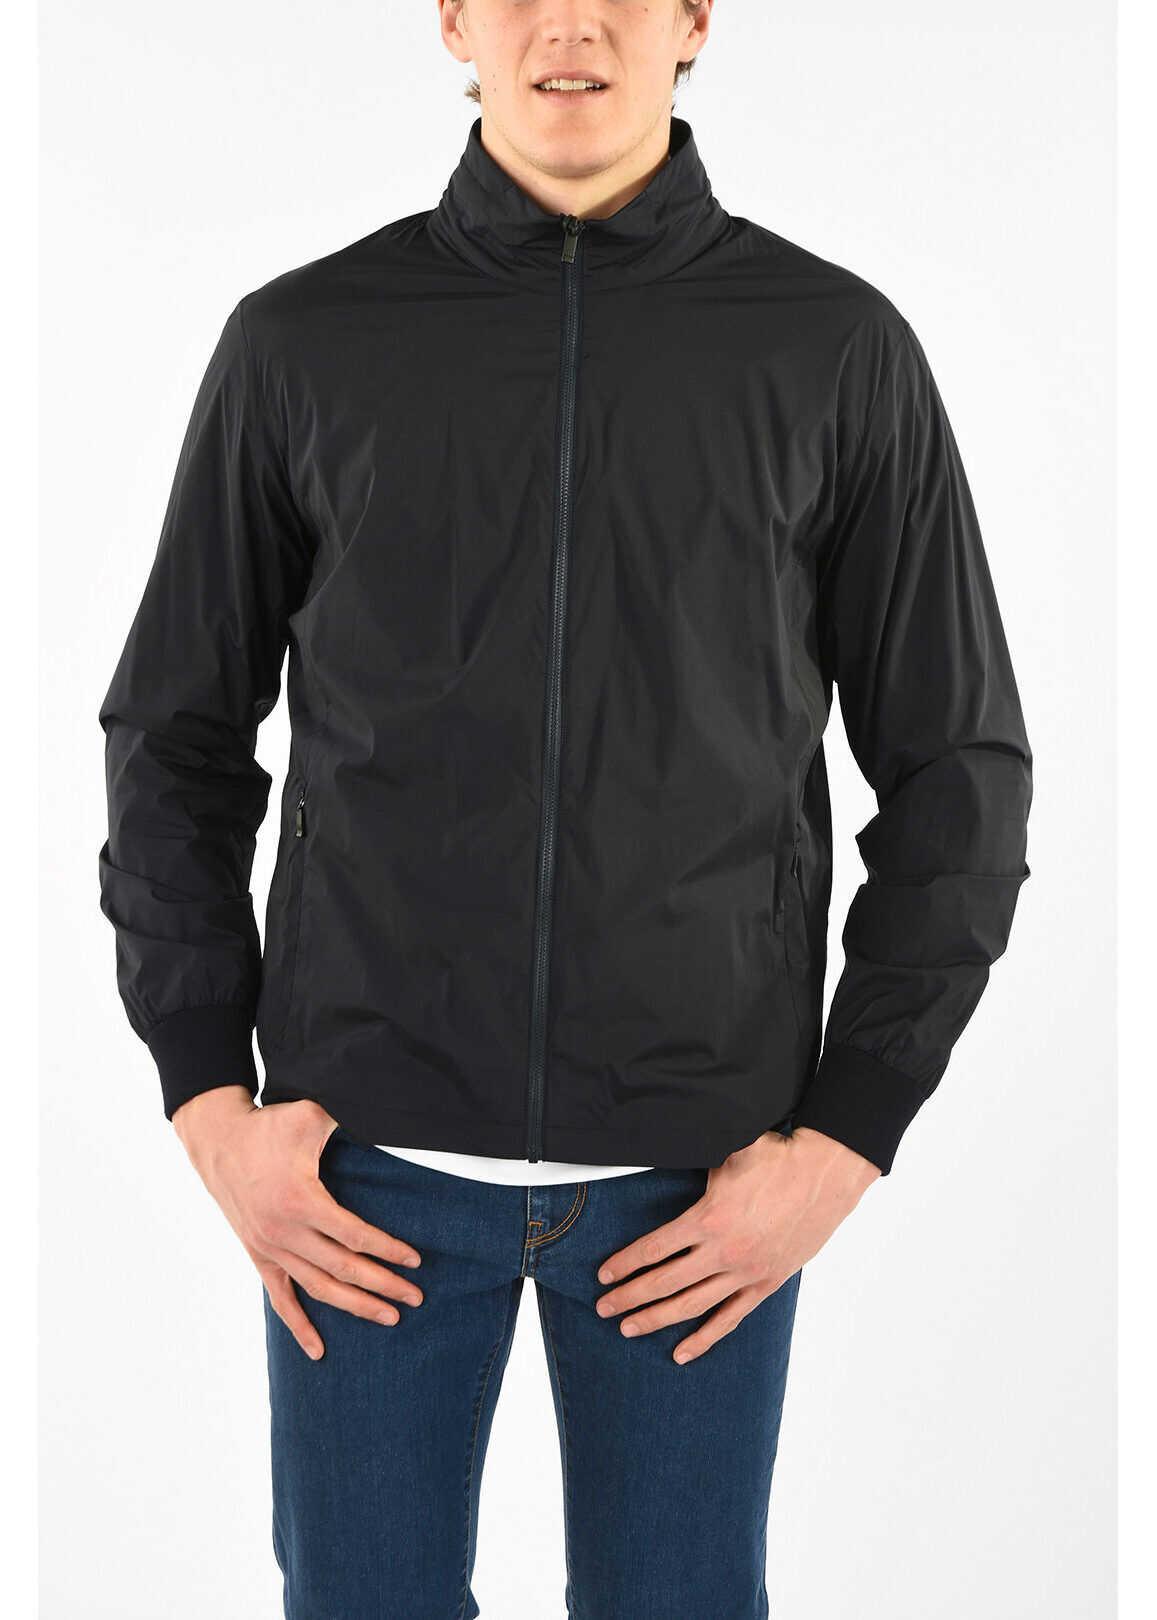 Z ZEGNA Reversible TECHMERINO Jacket with Zip Closure